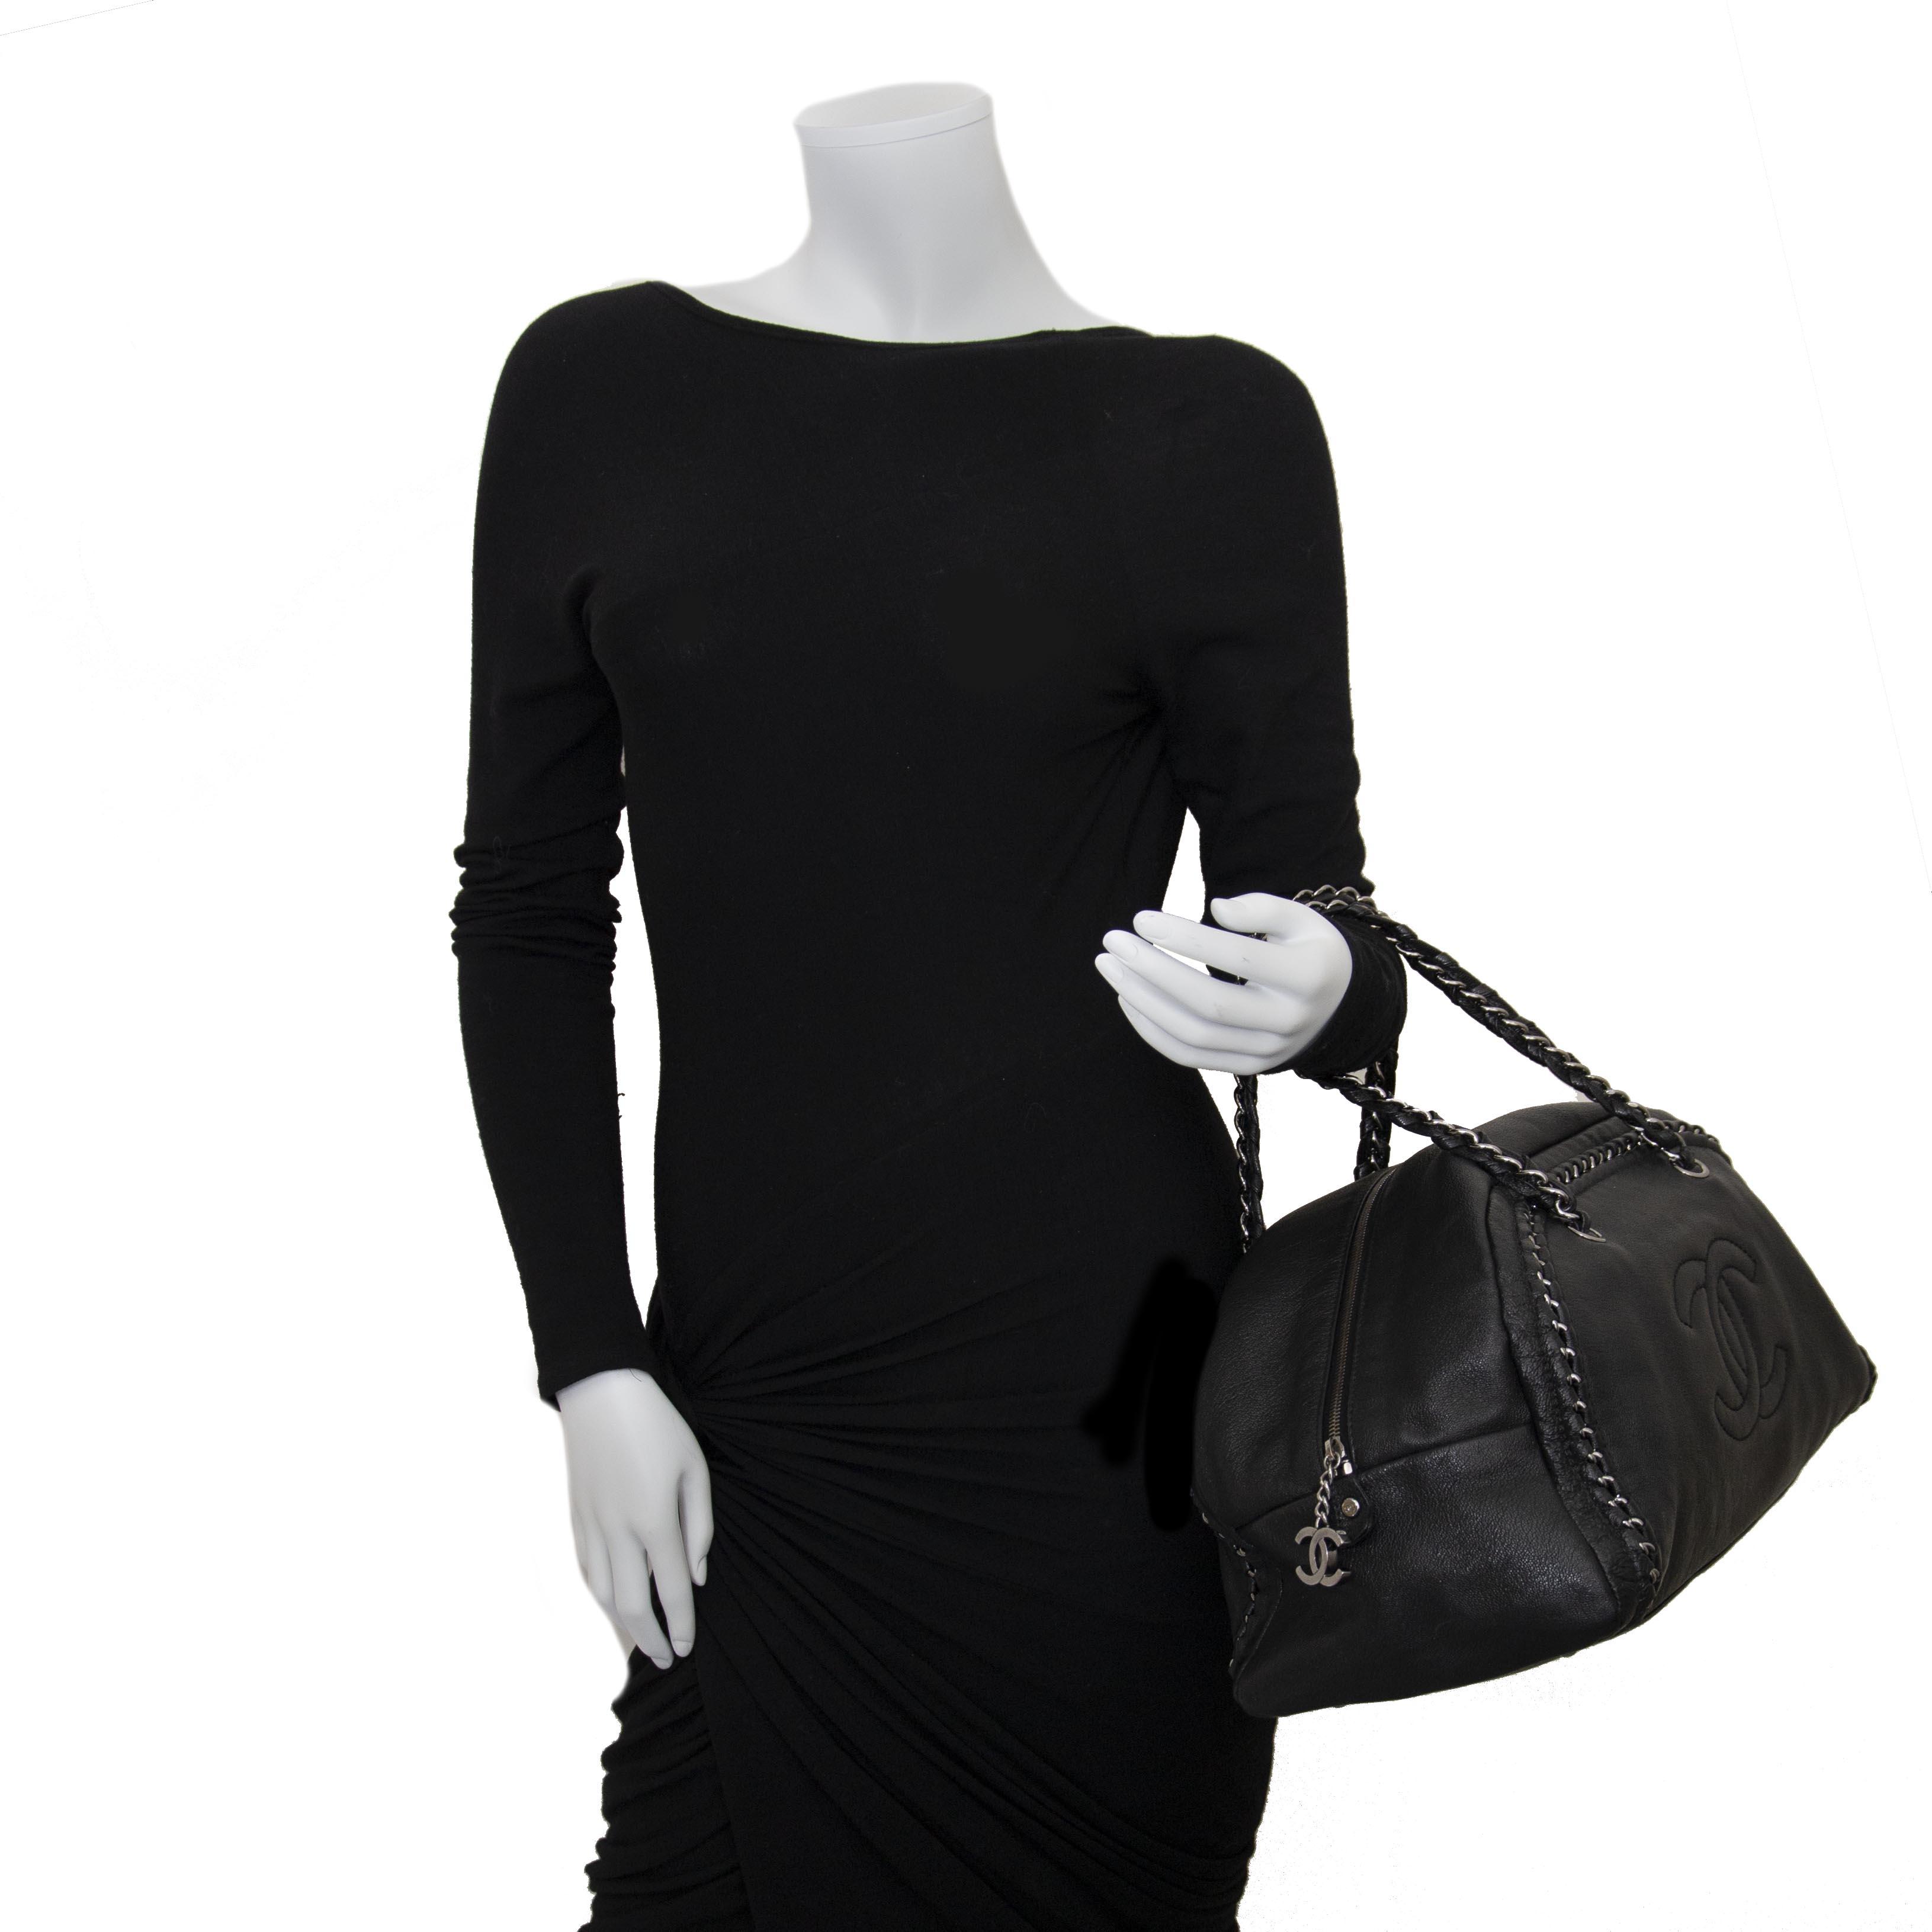 chanel zwarte leder bowling tas nu te koop bij labellov vintage mode webshop aan de laagste prijs